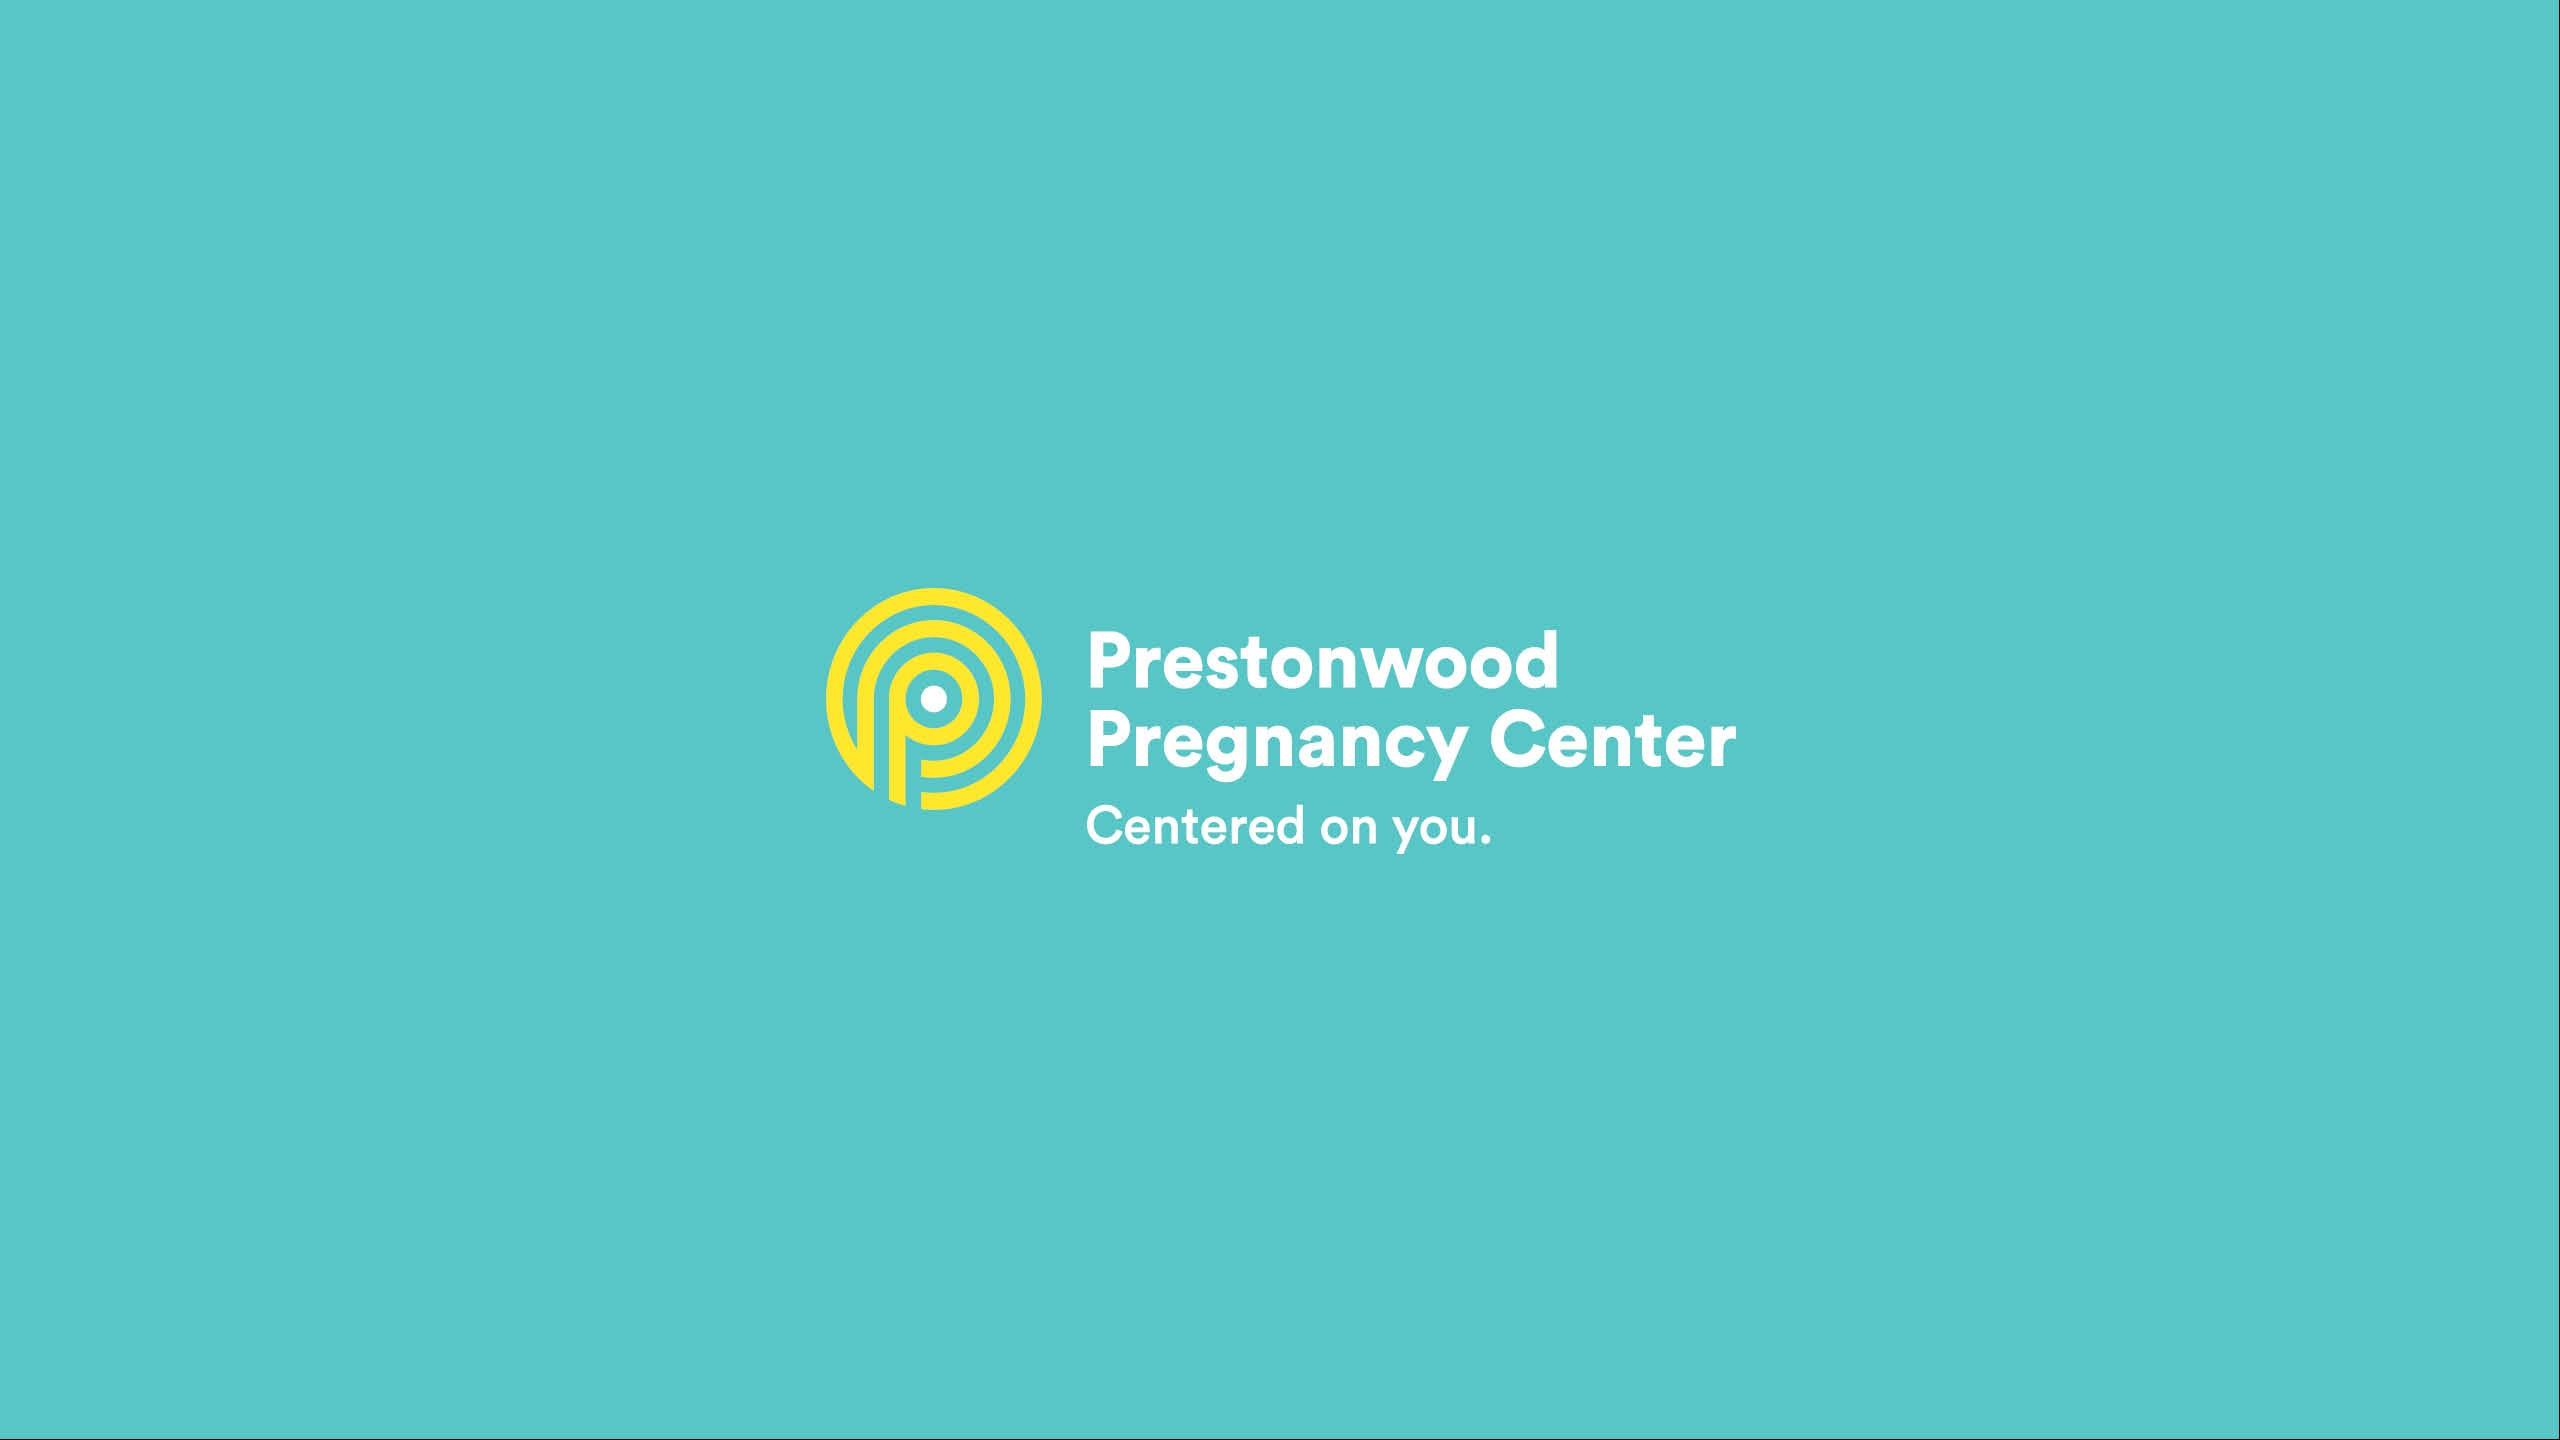 WATCH: Prestonwood Pregnancy Center in Texas Celebrates Saving 90,000 Babies from Abortion